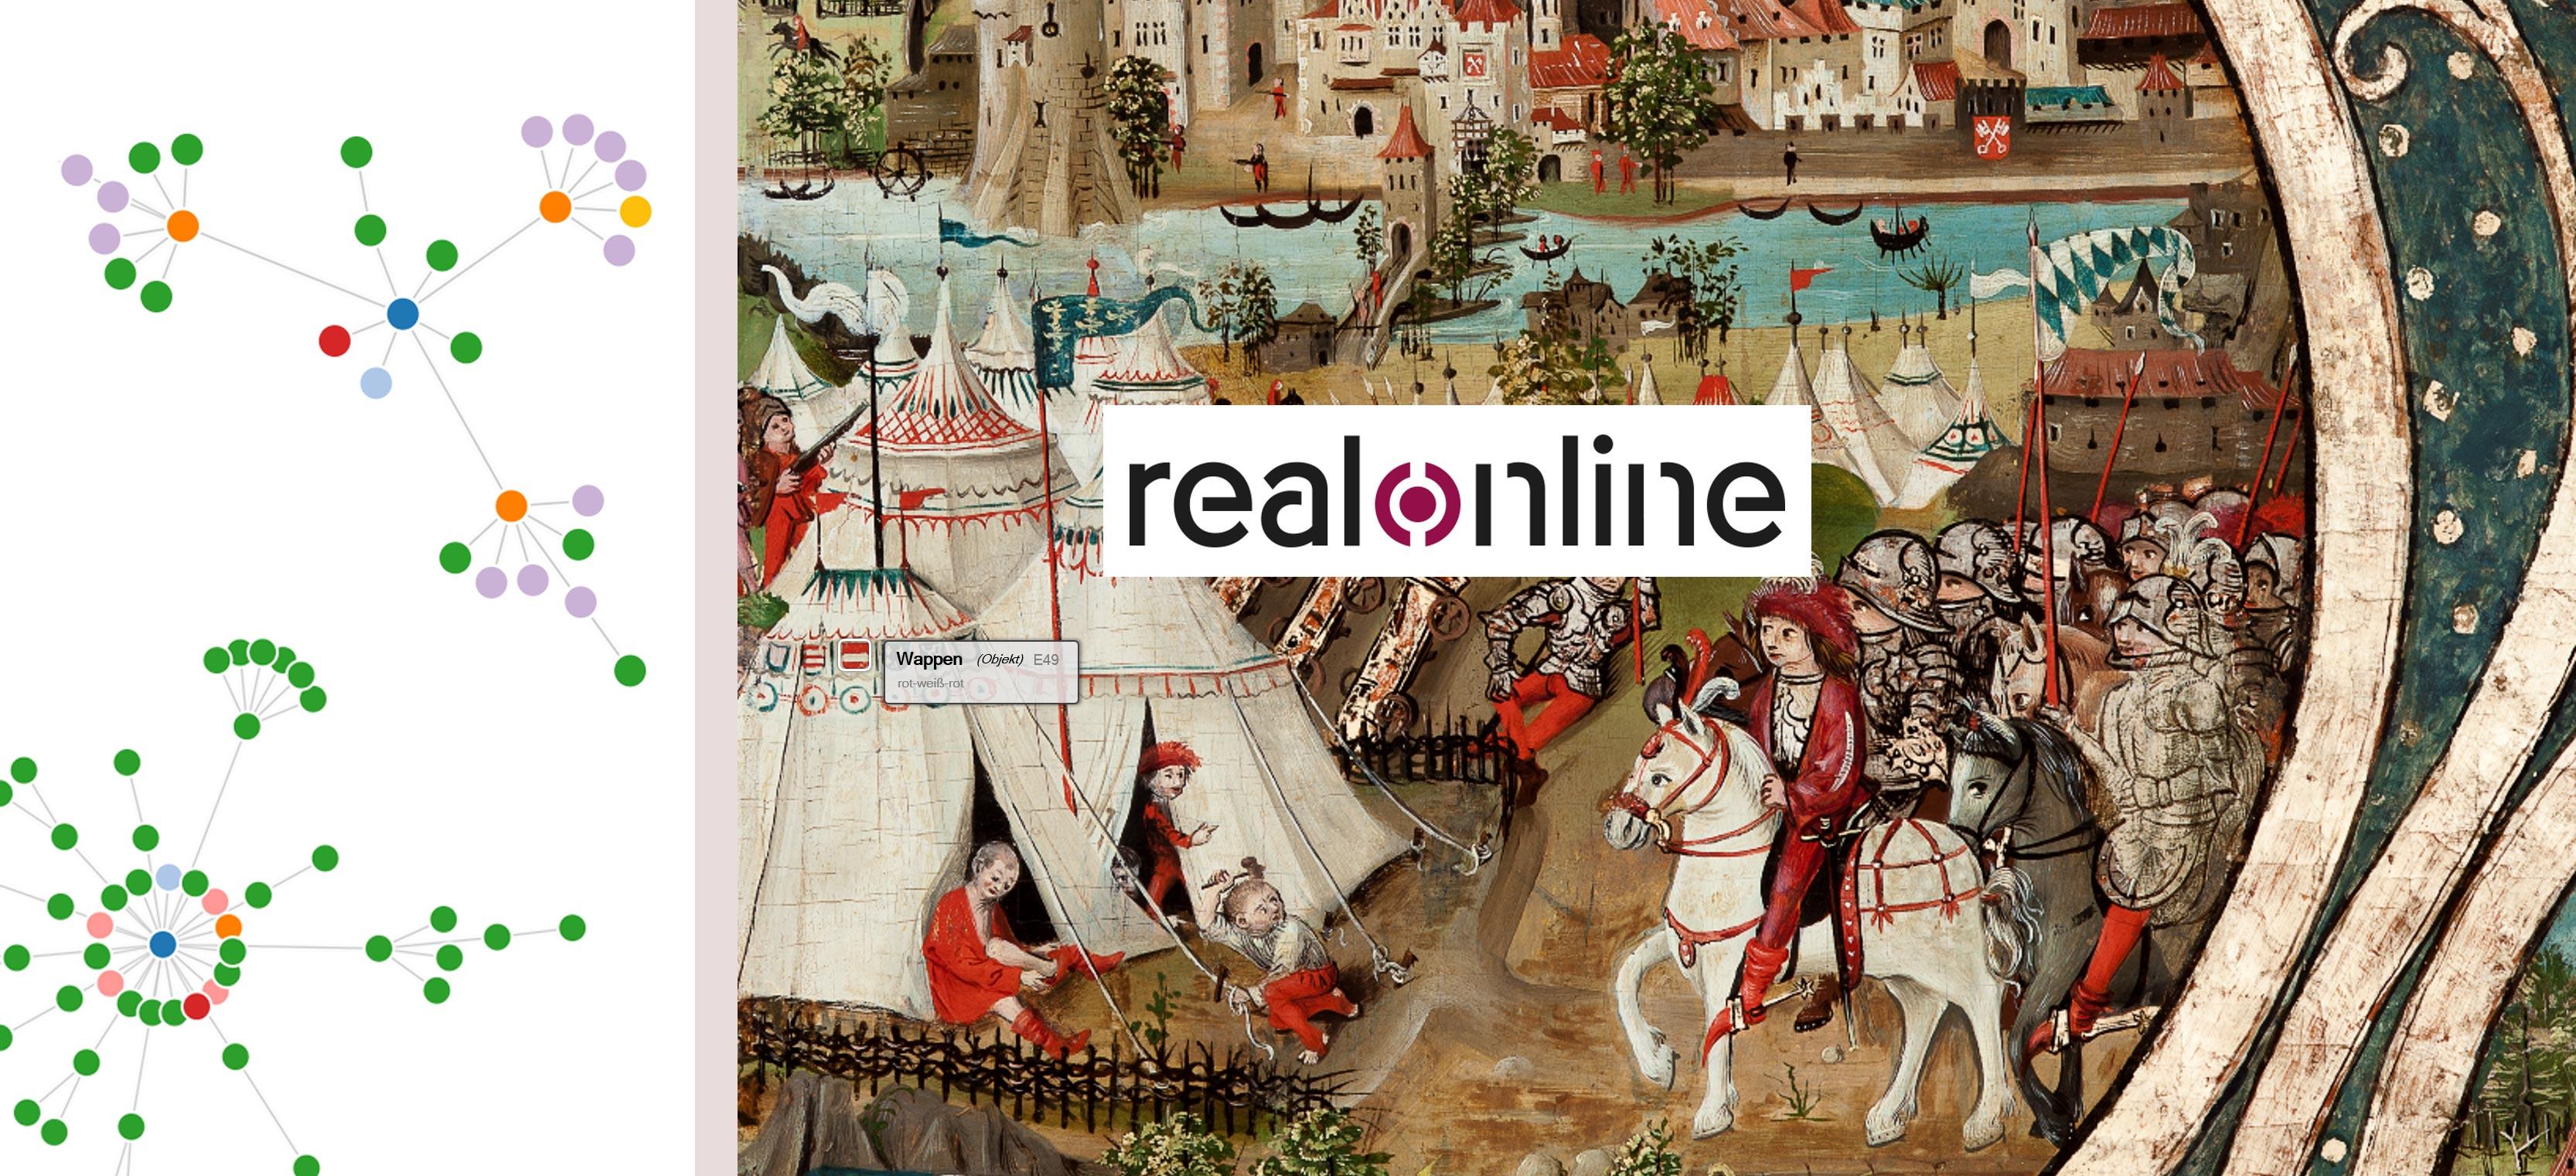 Bilddatenbank REALonline